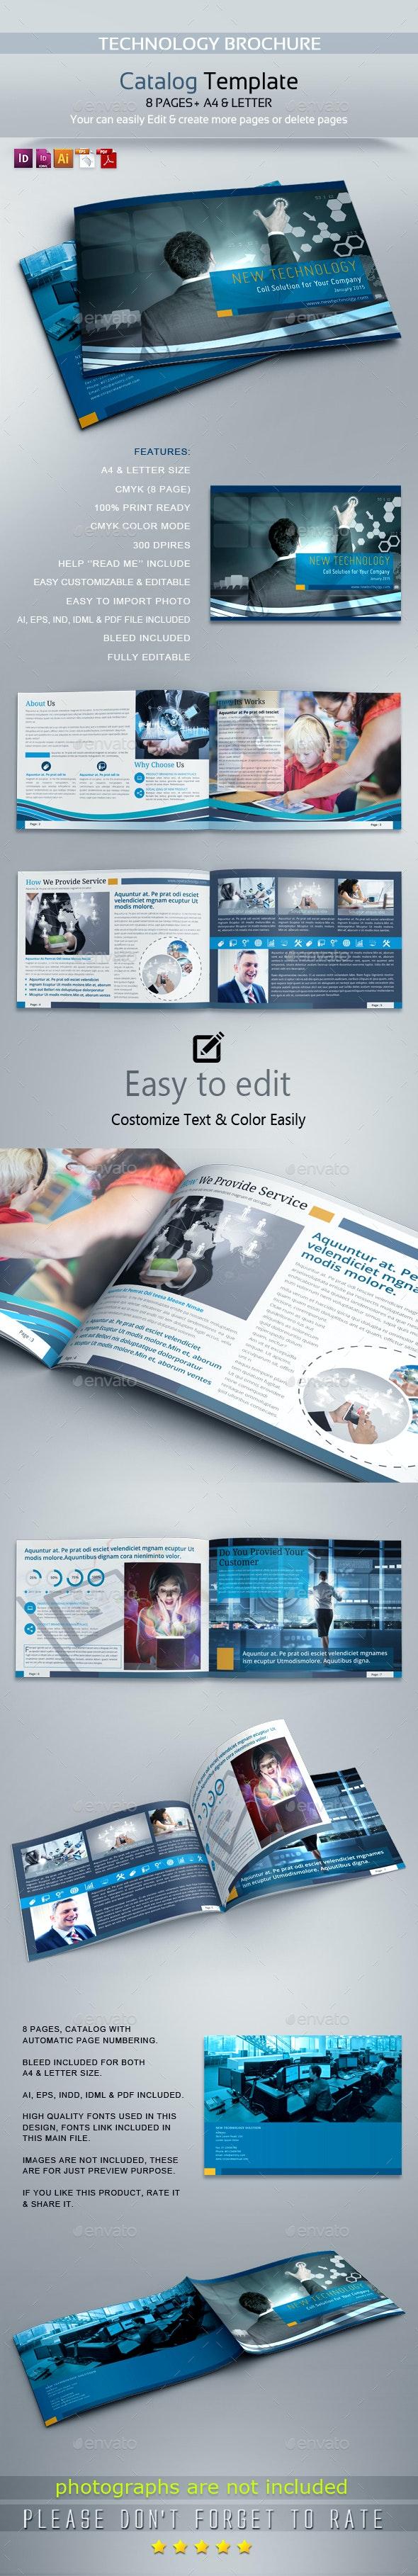 Technology Brochure Catalog Design - Brochures Print Templates